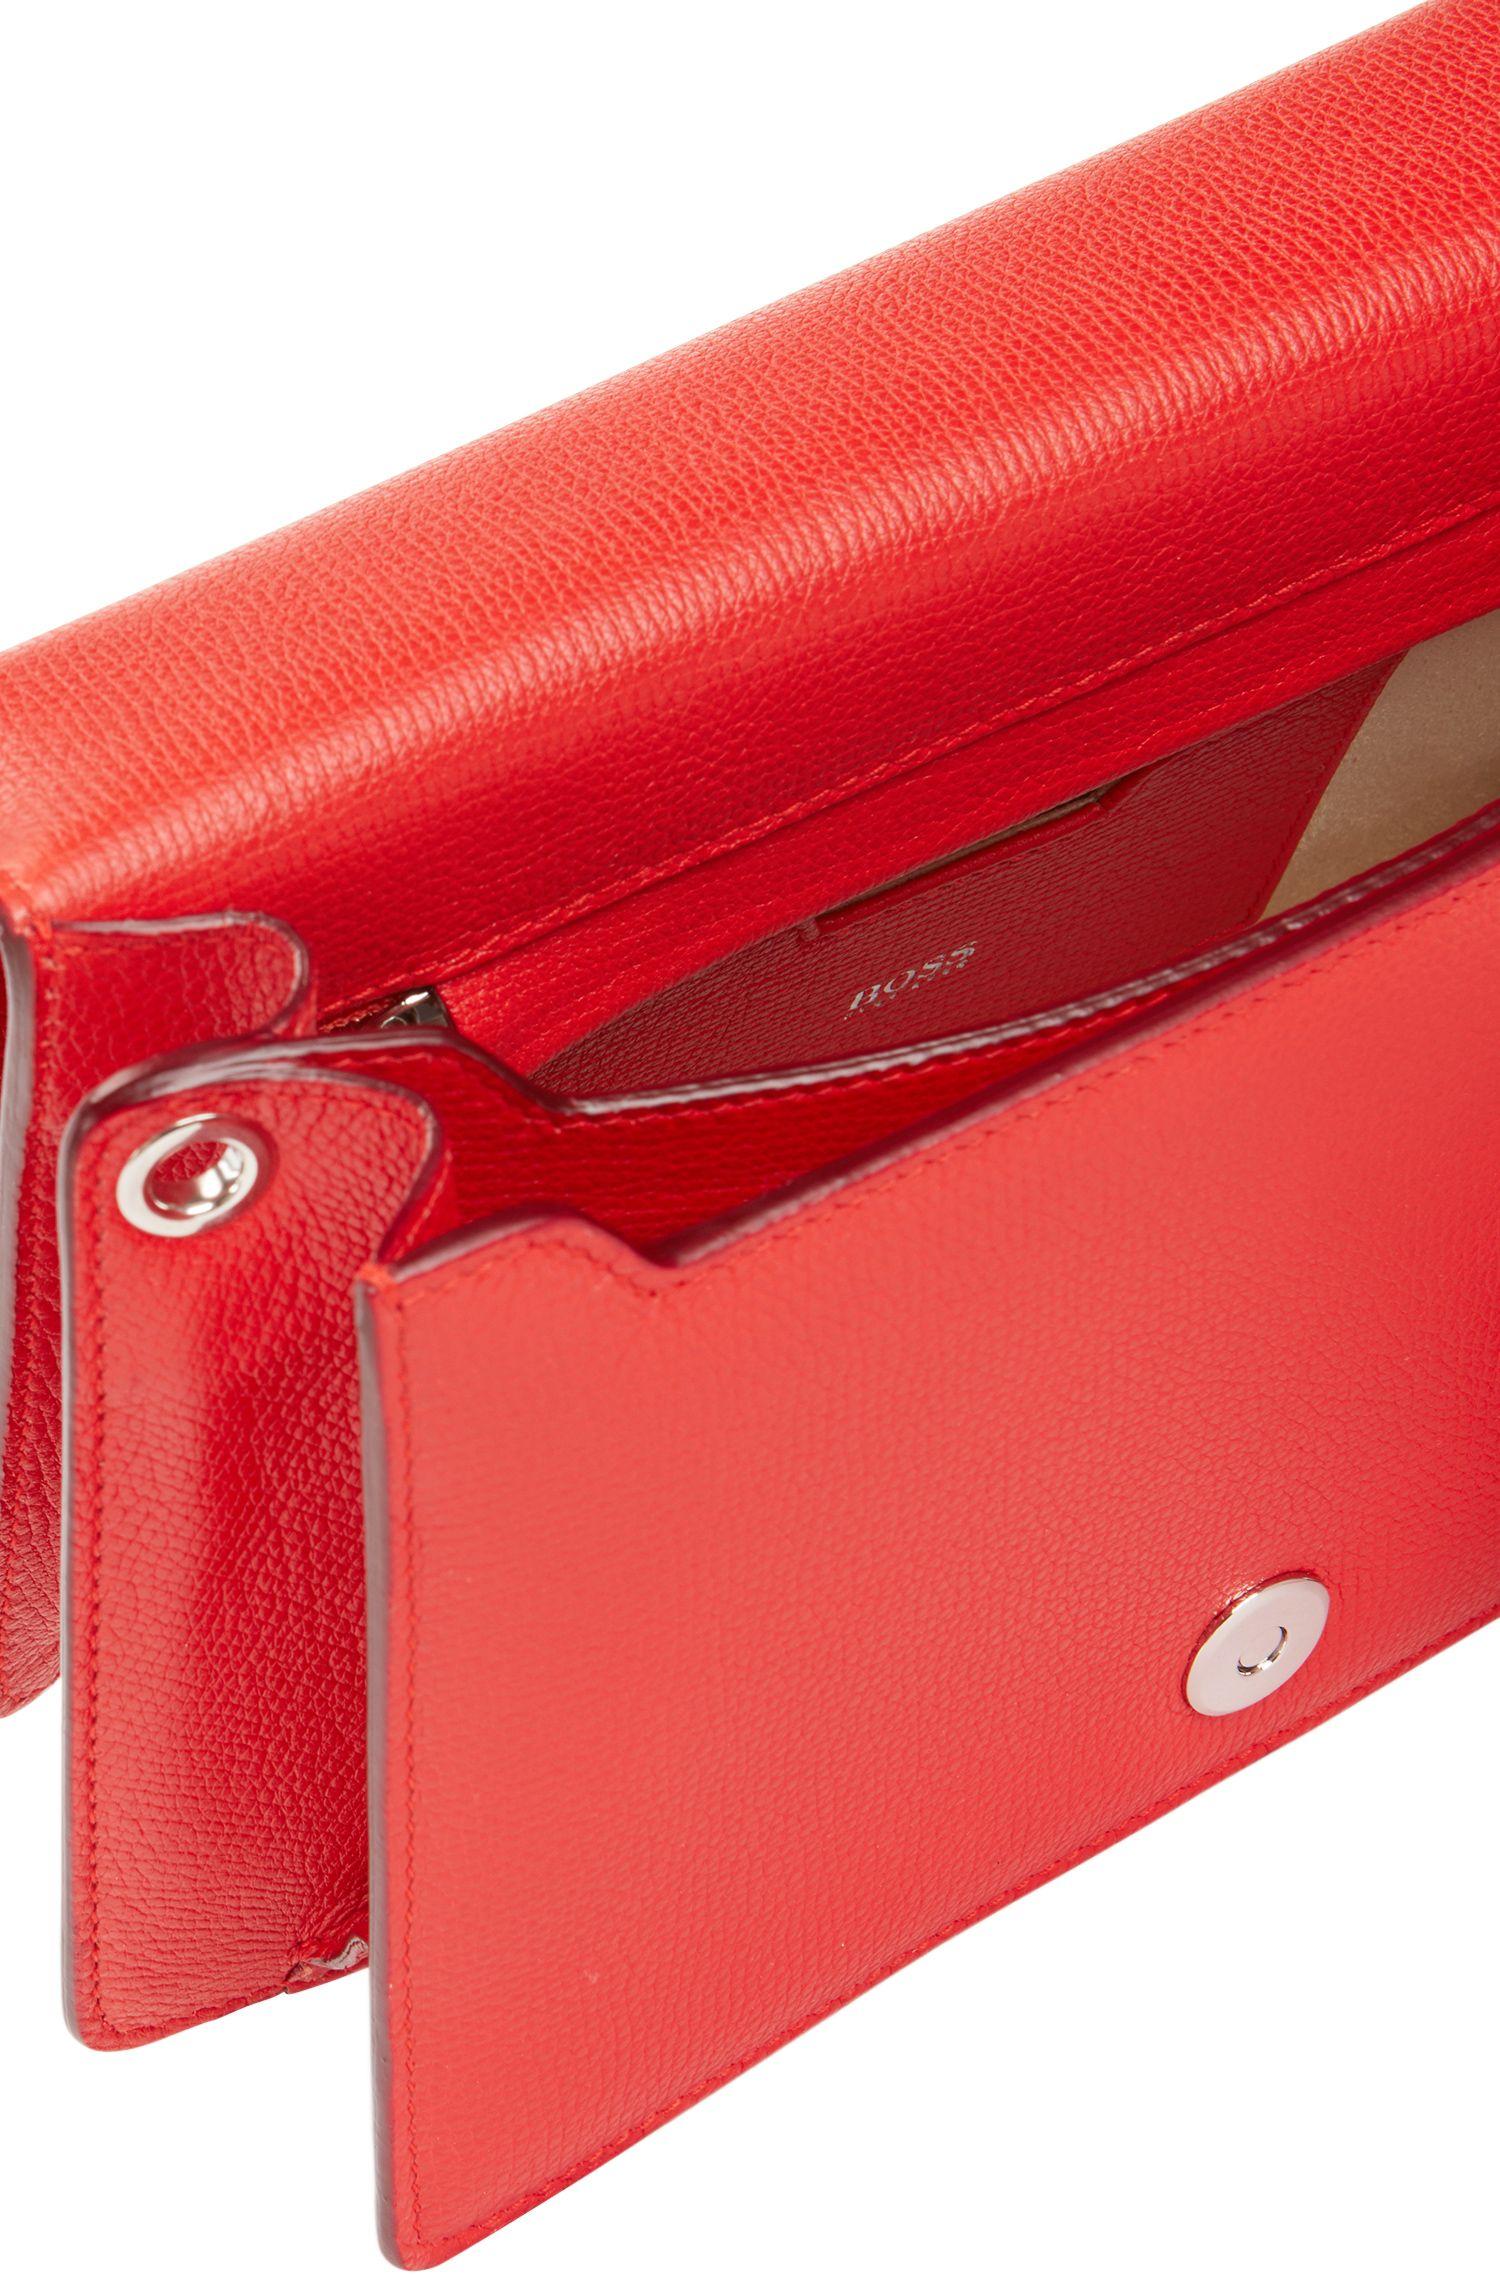 Crossbody bag in grained Italian calf leather